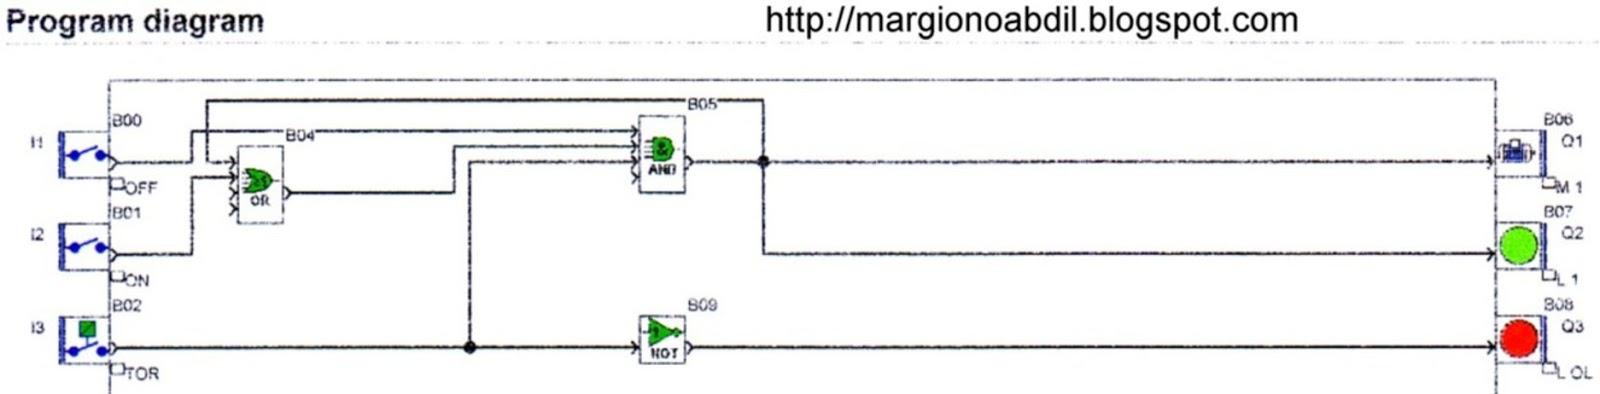 Blog Teknik  U0026 Vokasi  Program Plc Fbd Untuk Pengoperasian